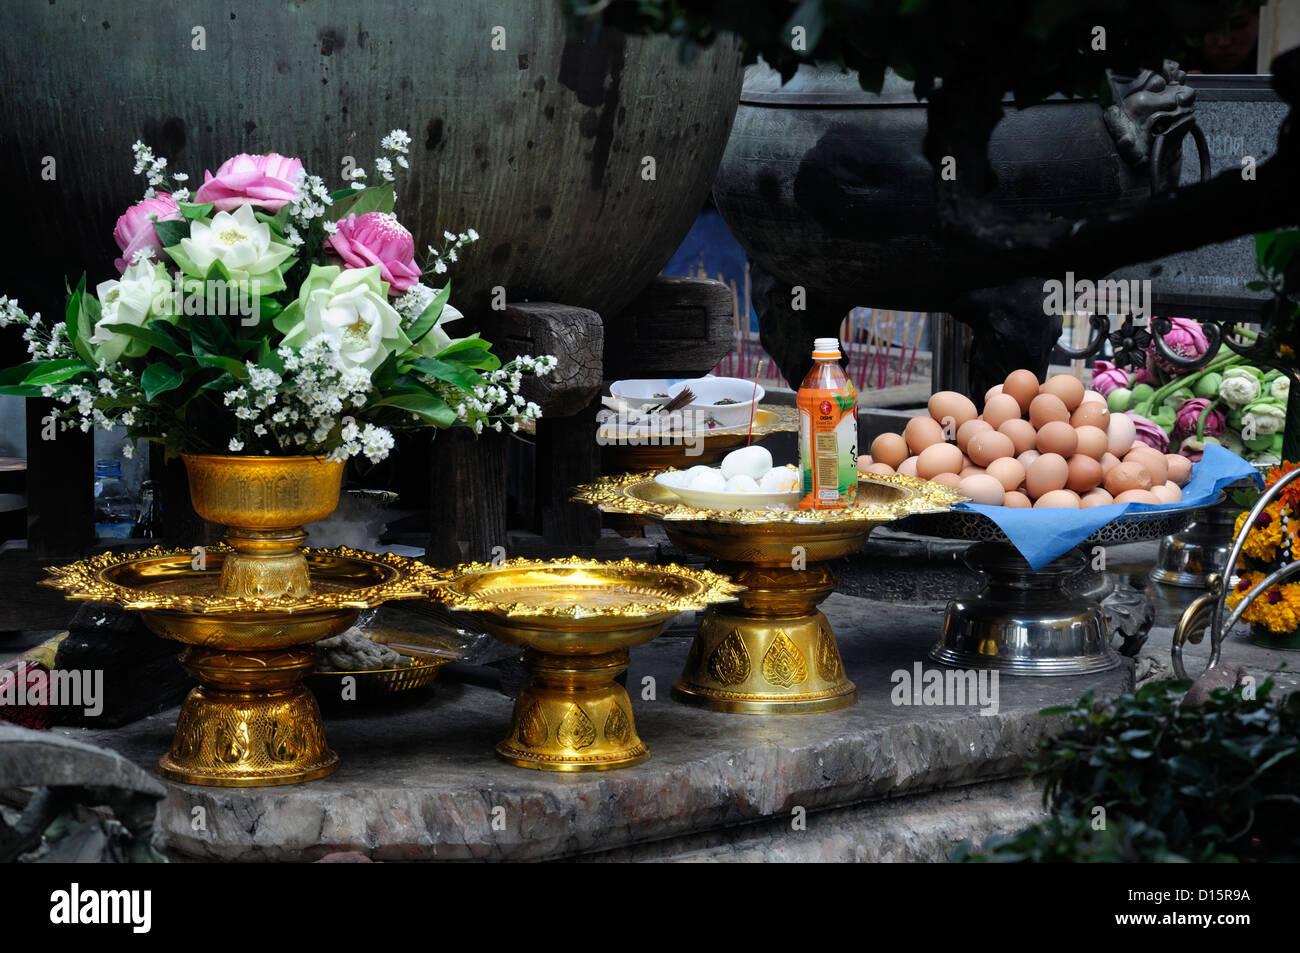 Grand Palace Bangkok Thailand Wat Phra Kaew Temple of the Emerald Buddha gold plate platters patten food offerings - Stock Image